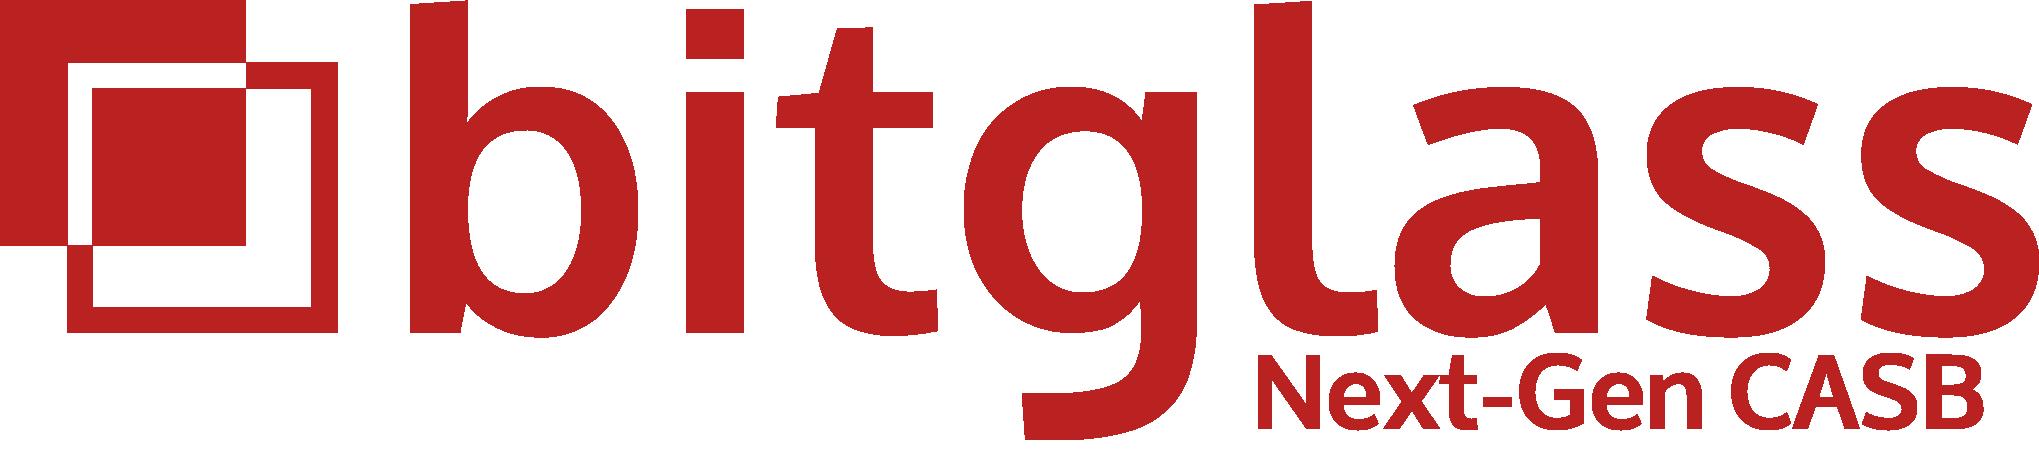 Bitglass CASB logo